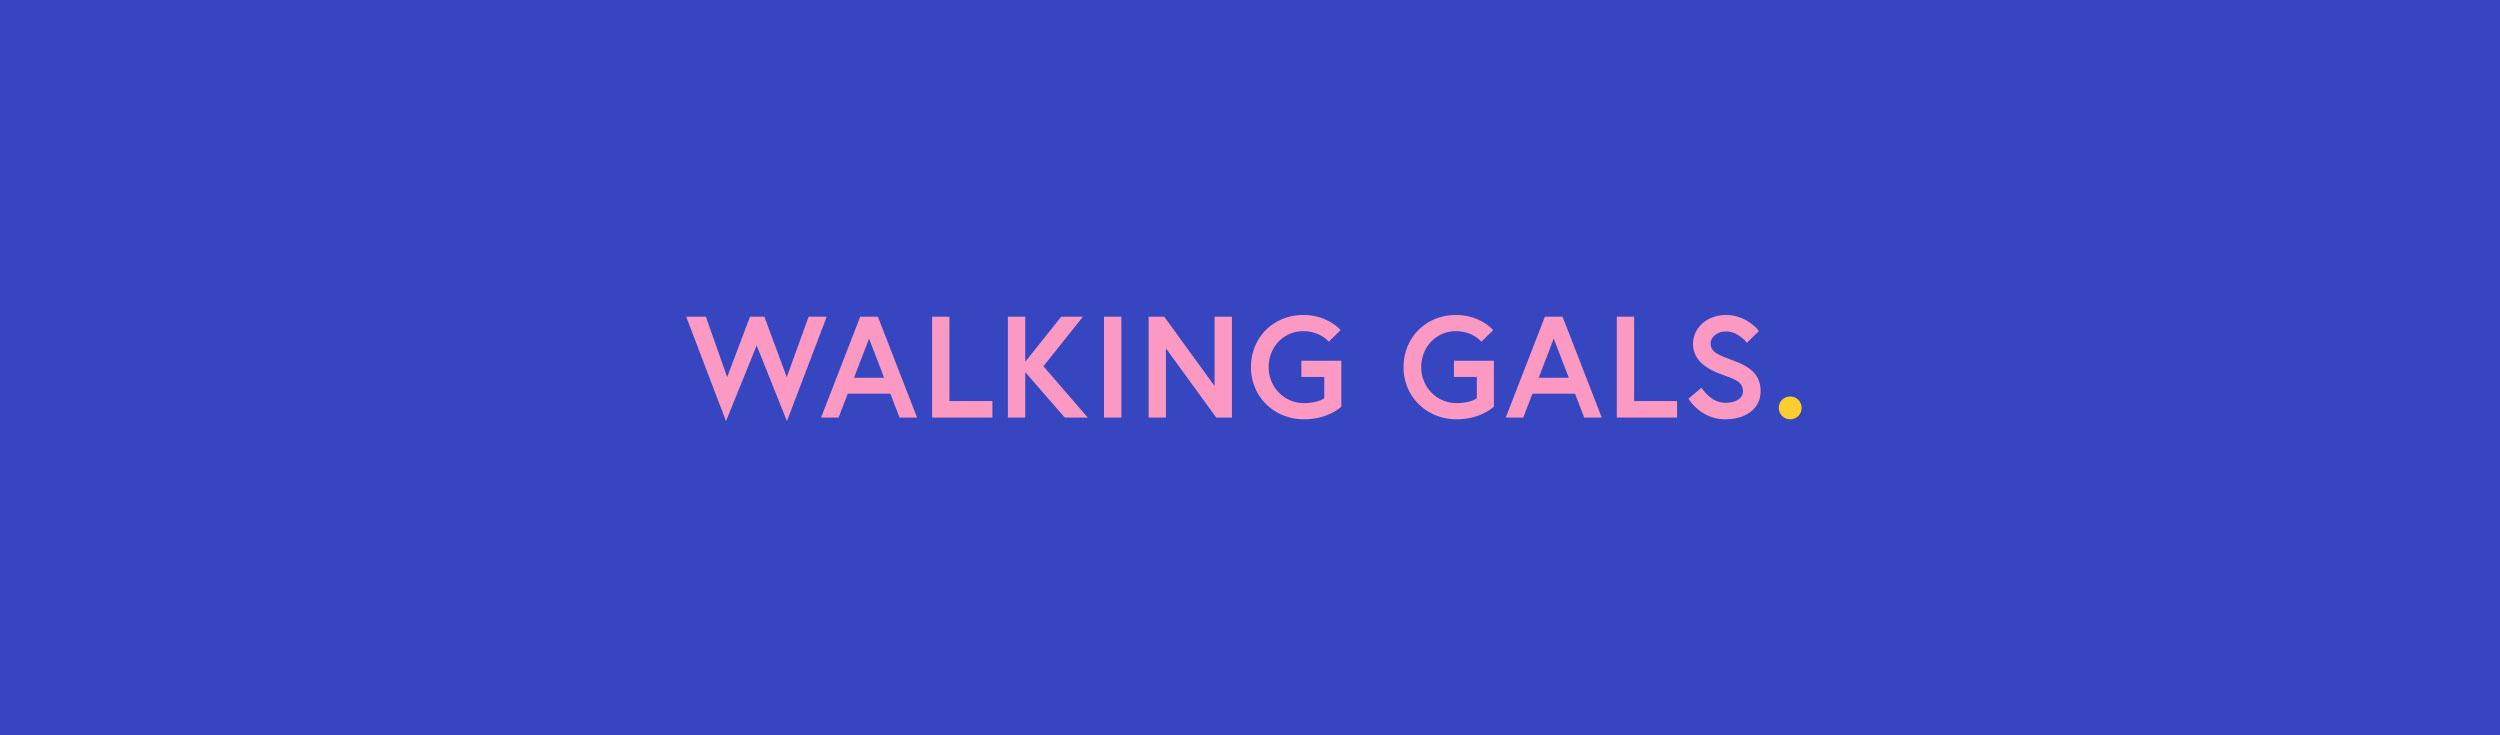 walking-gals-2500x735-03.jpg